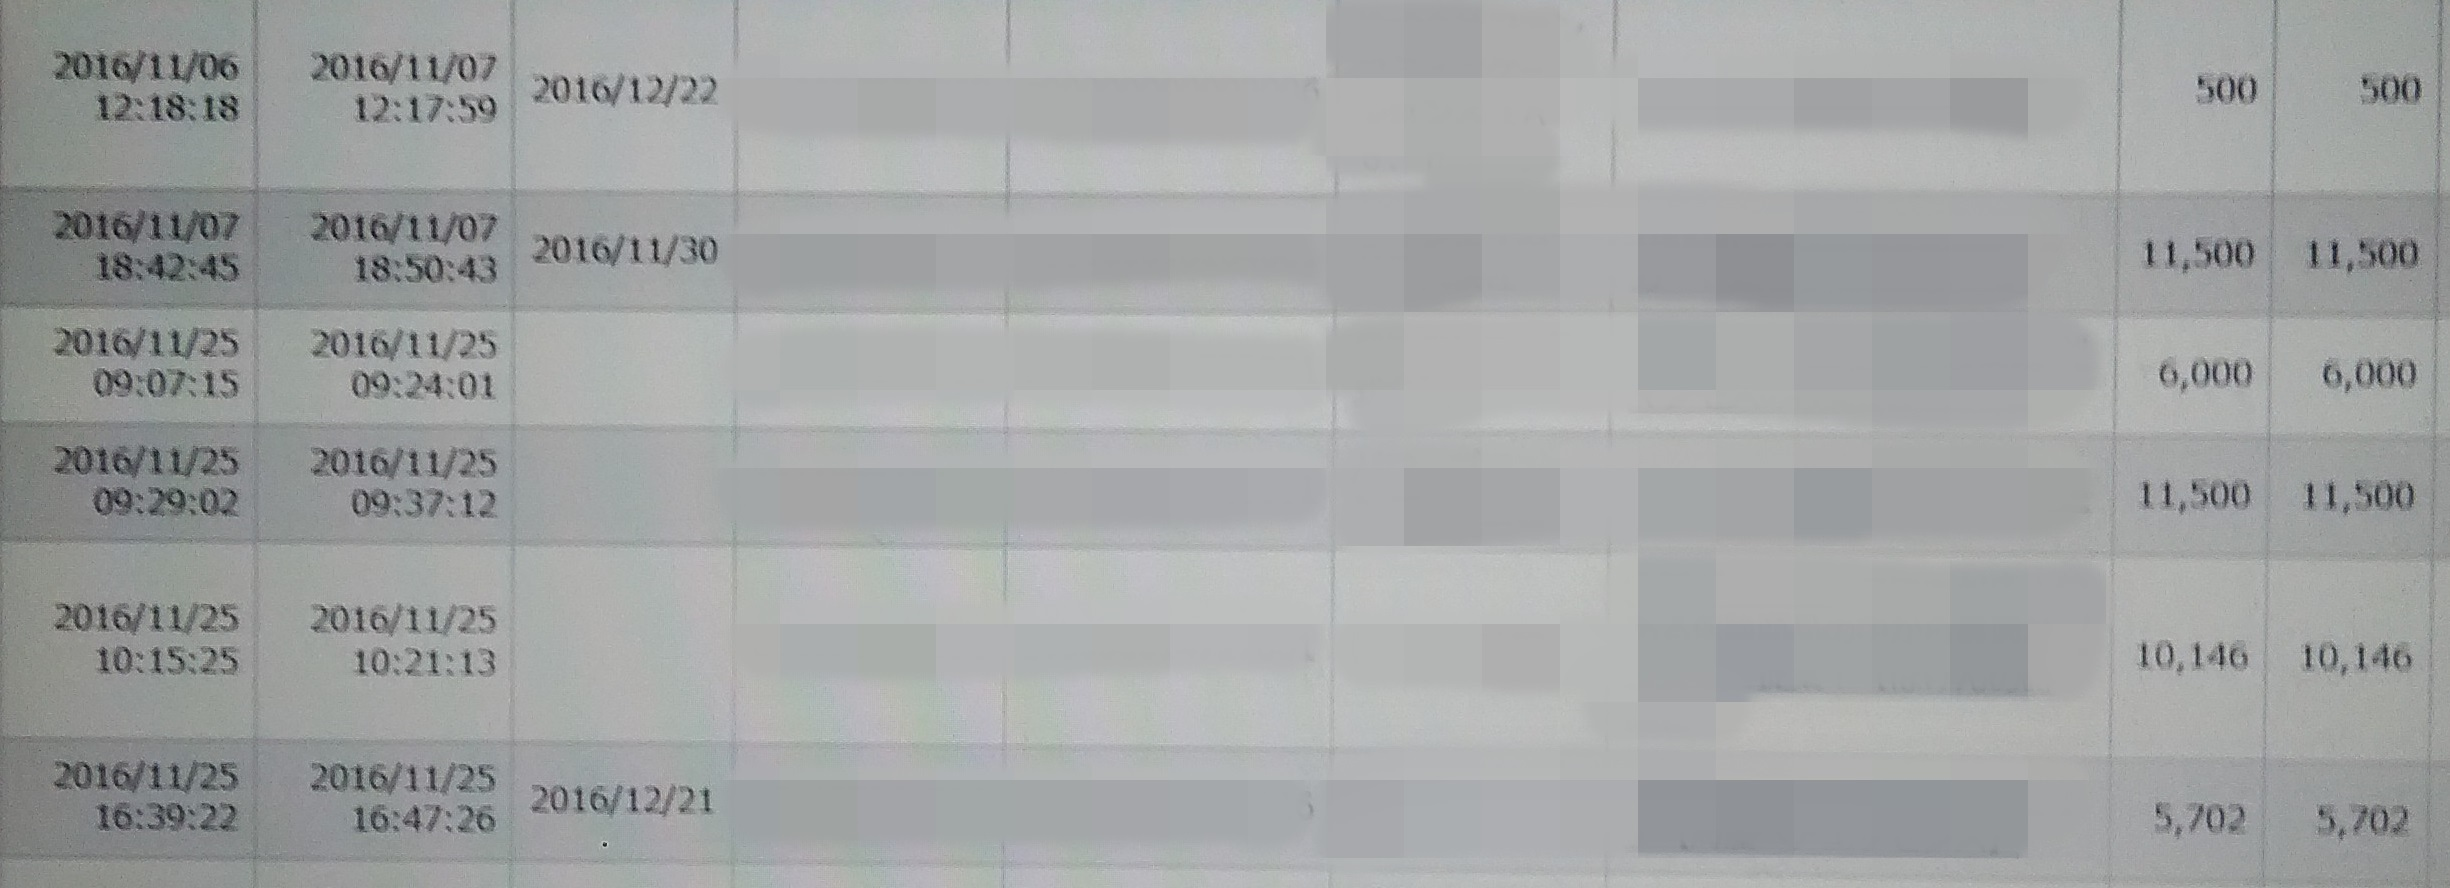 cc6c857915141a453234e6245b430982f993c45a334d9bf2a1pimgpsh_fullsize_distr